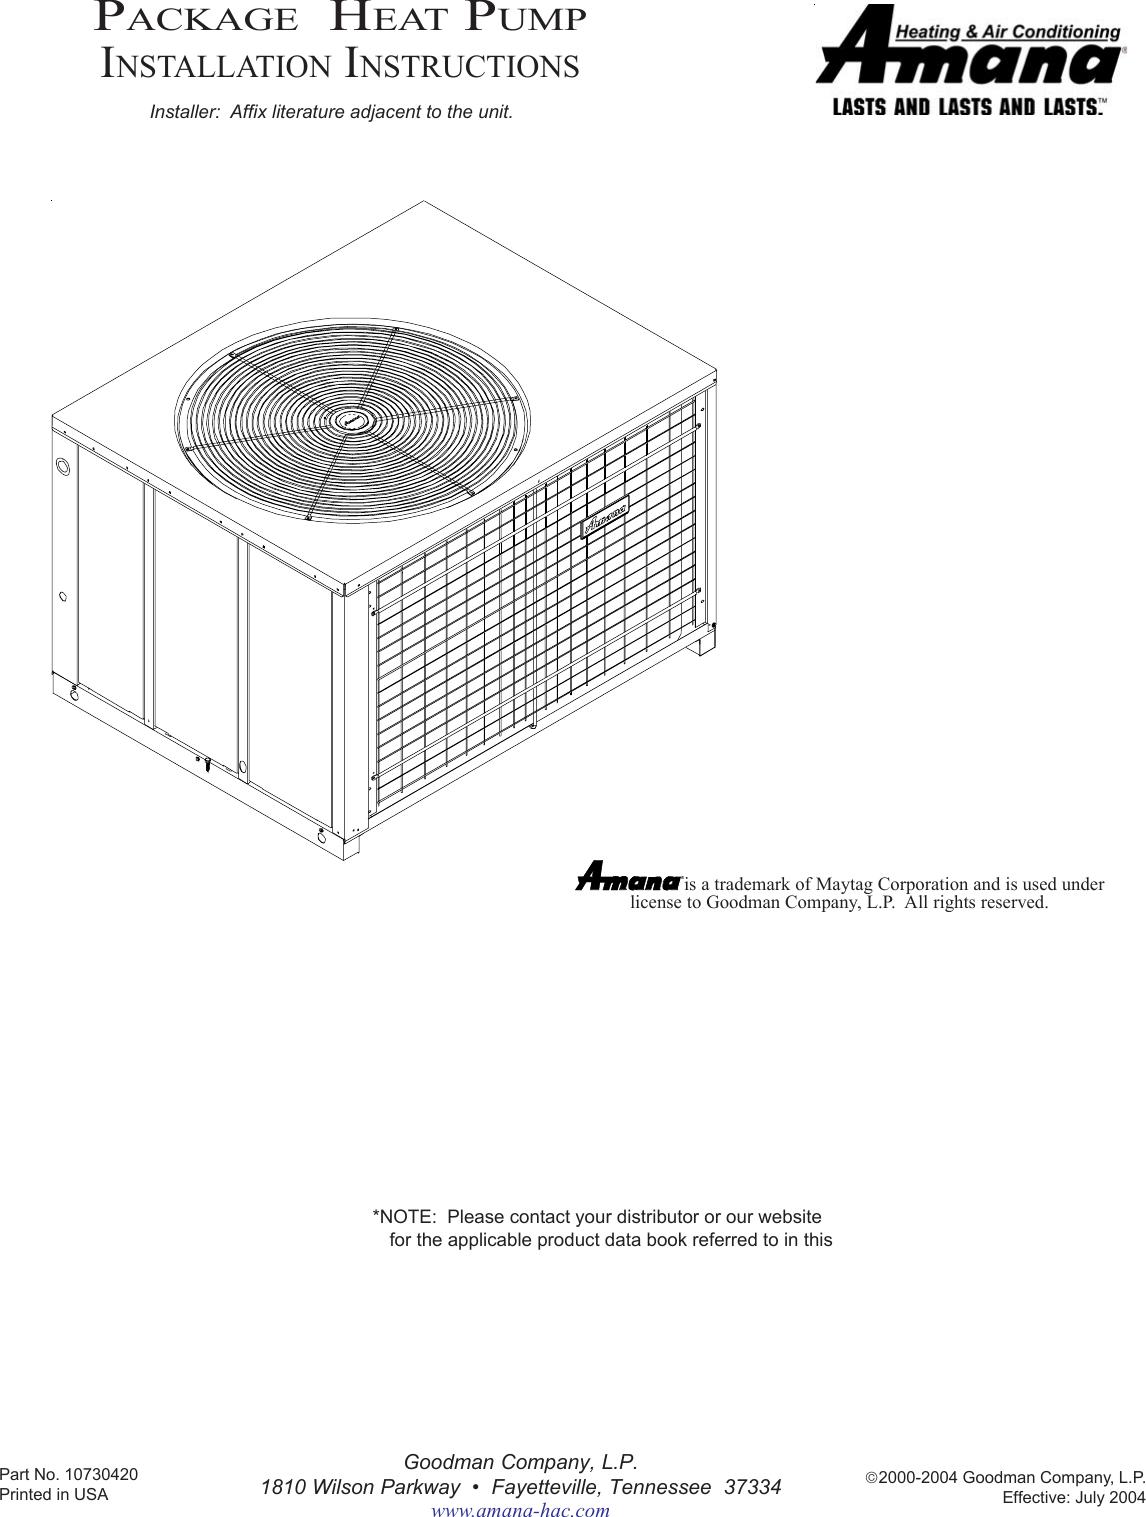 Amana Package Heat Pump Users Manual 10730418 Rev 3